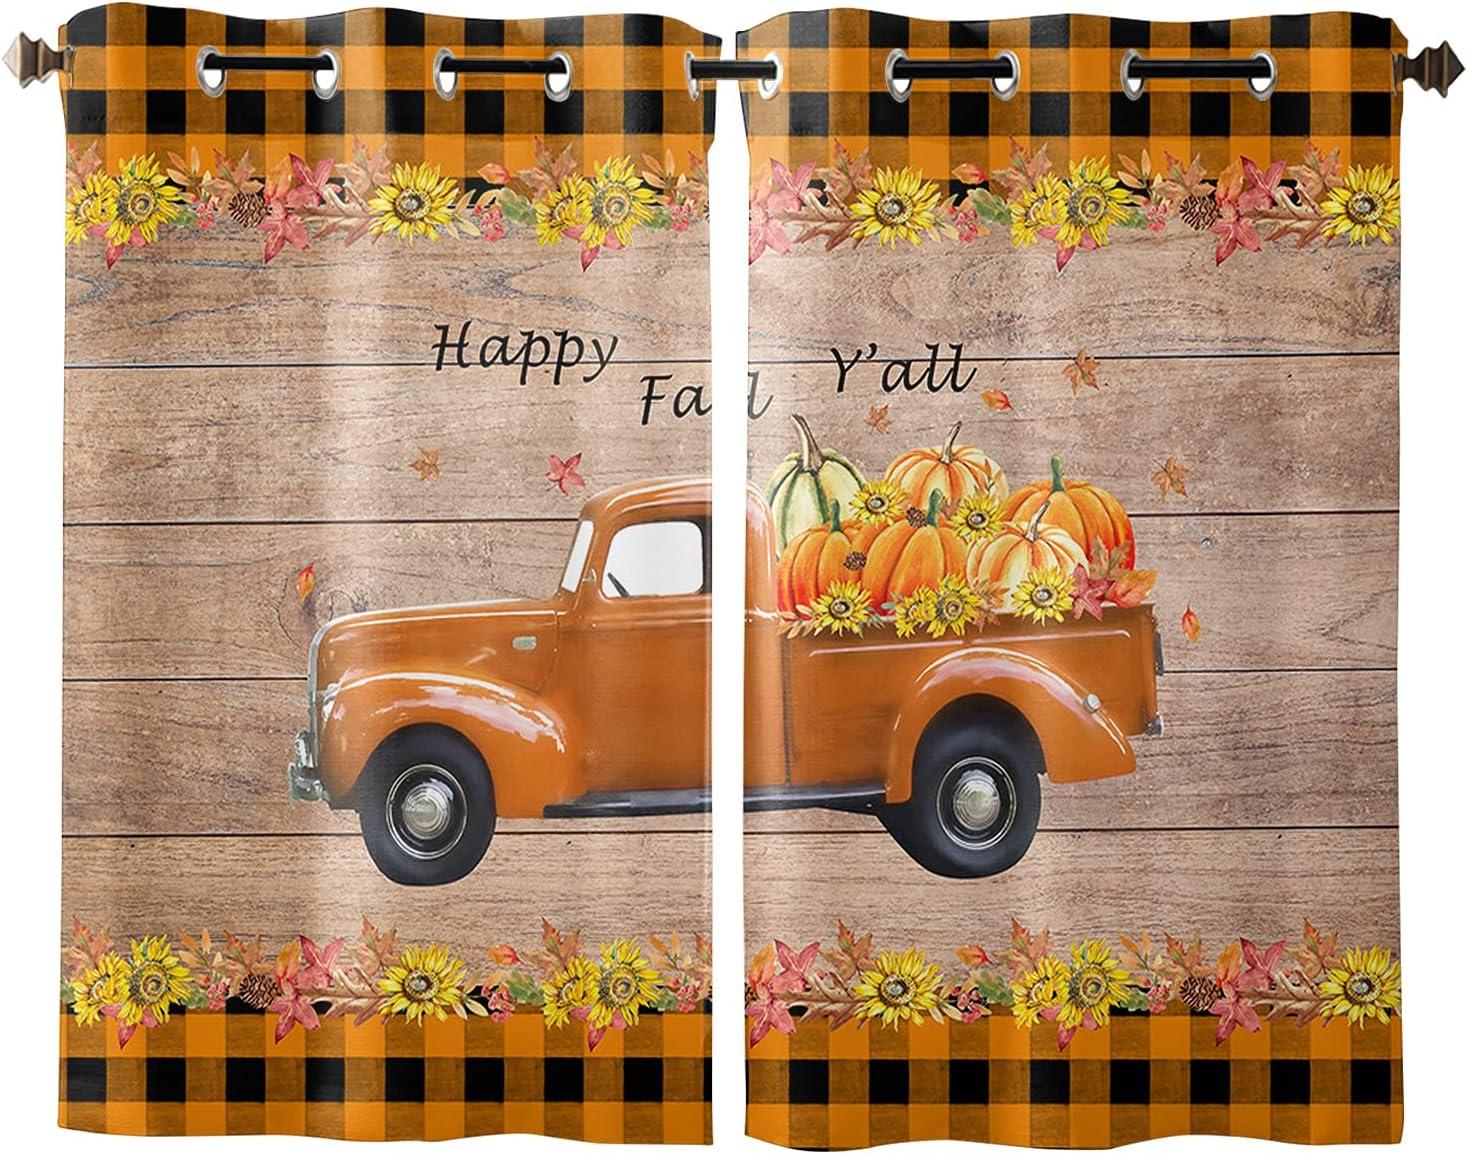 free shipping Window Curtain Fall Max 88% OFF Farm Harvest Sunflowers Pumpkin D Home Truck